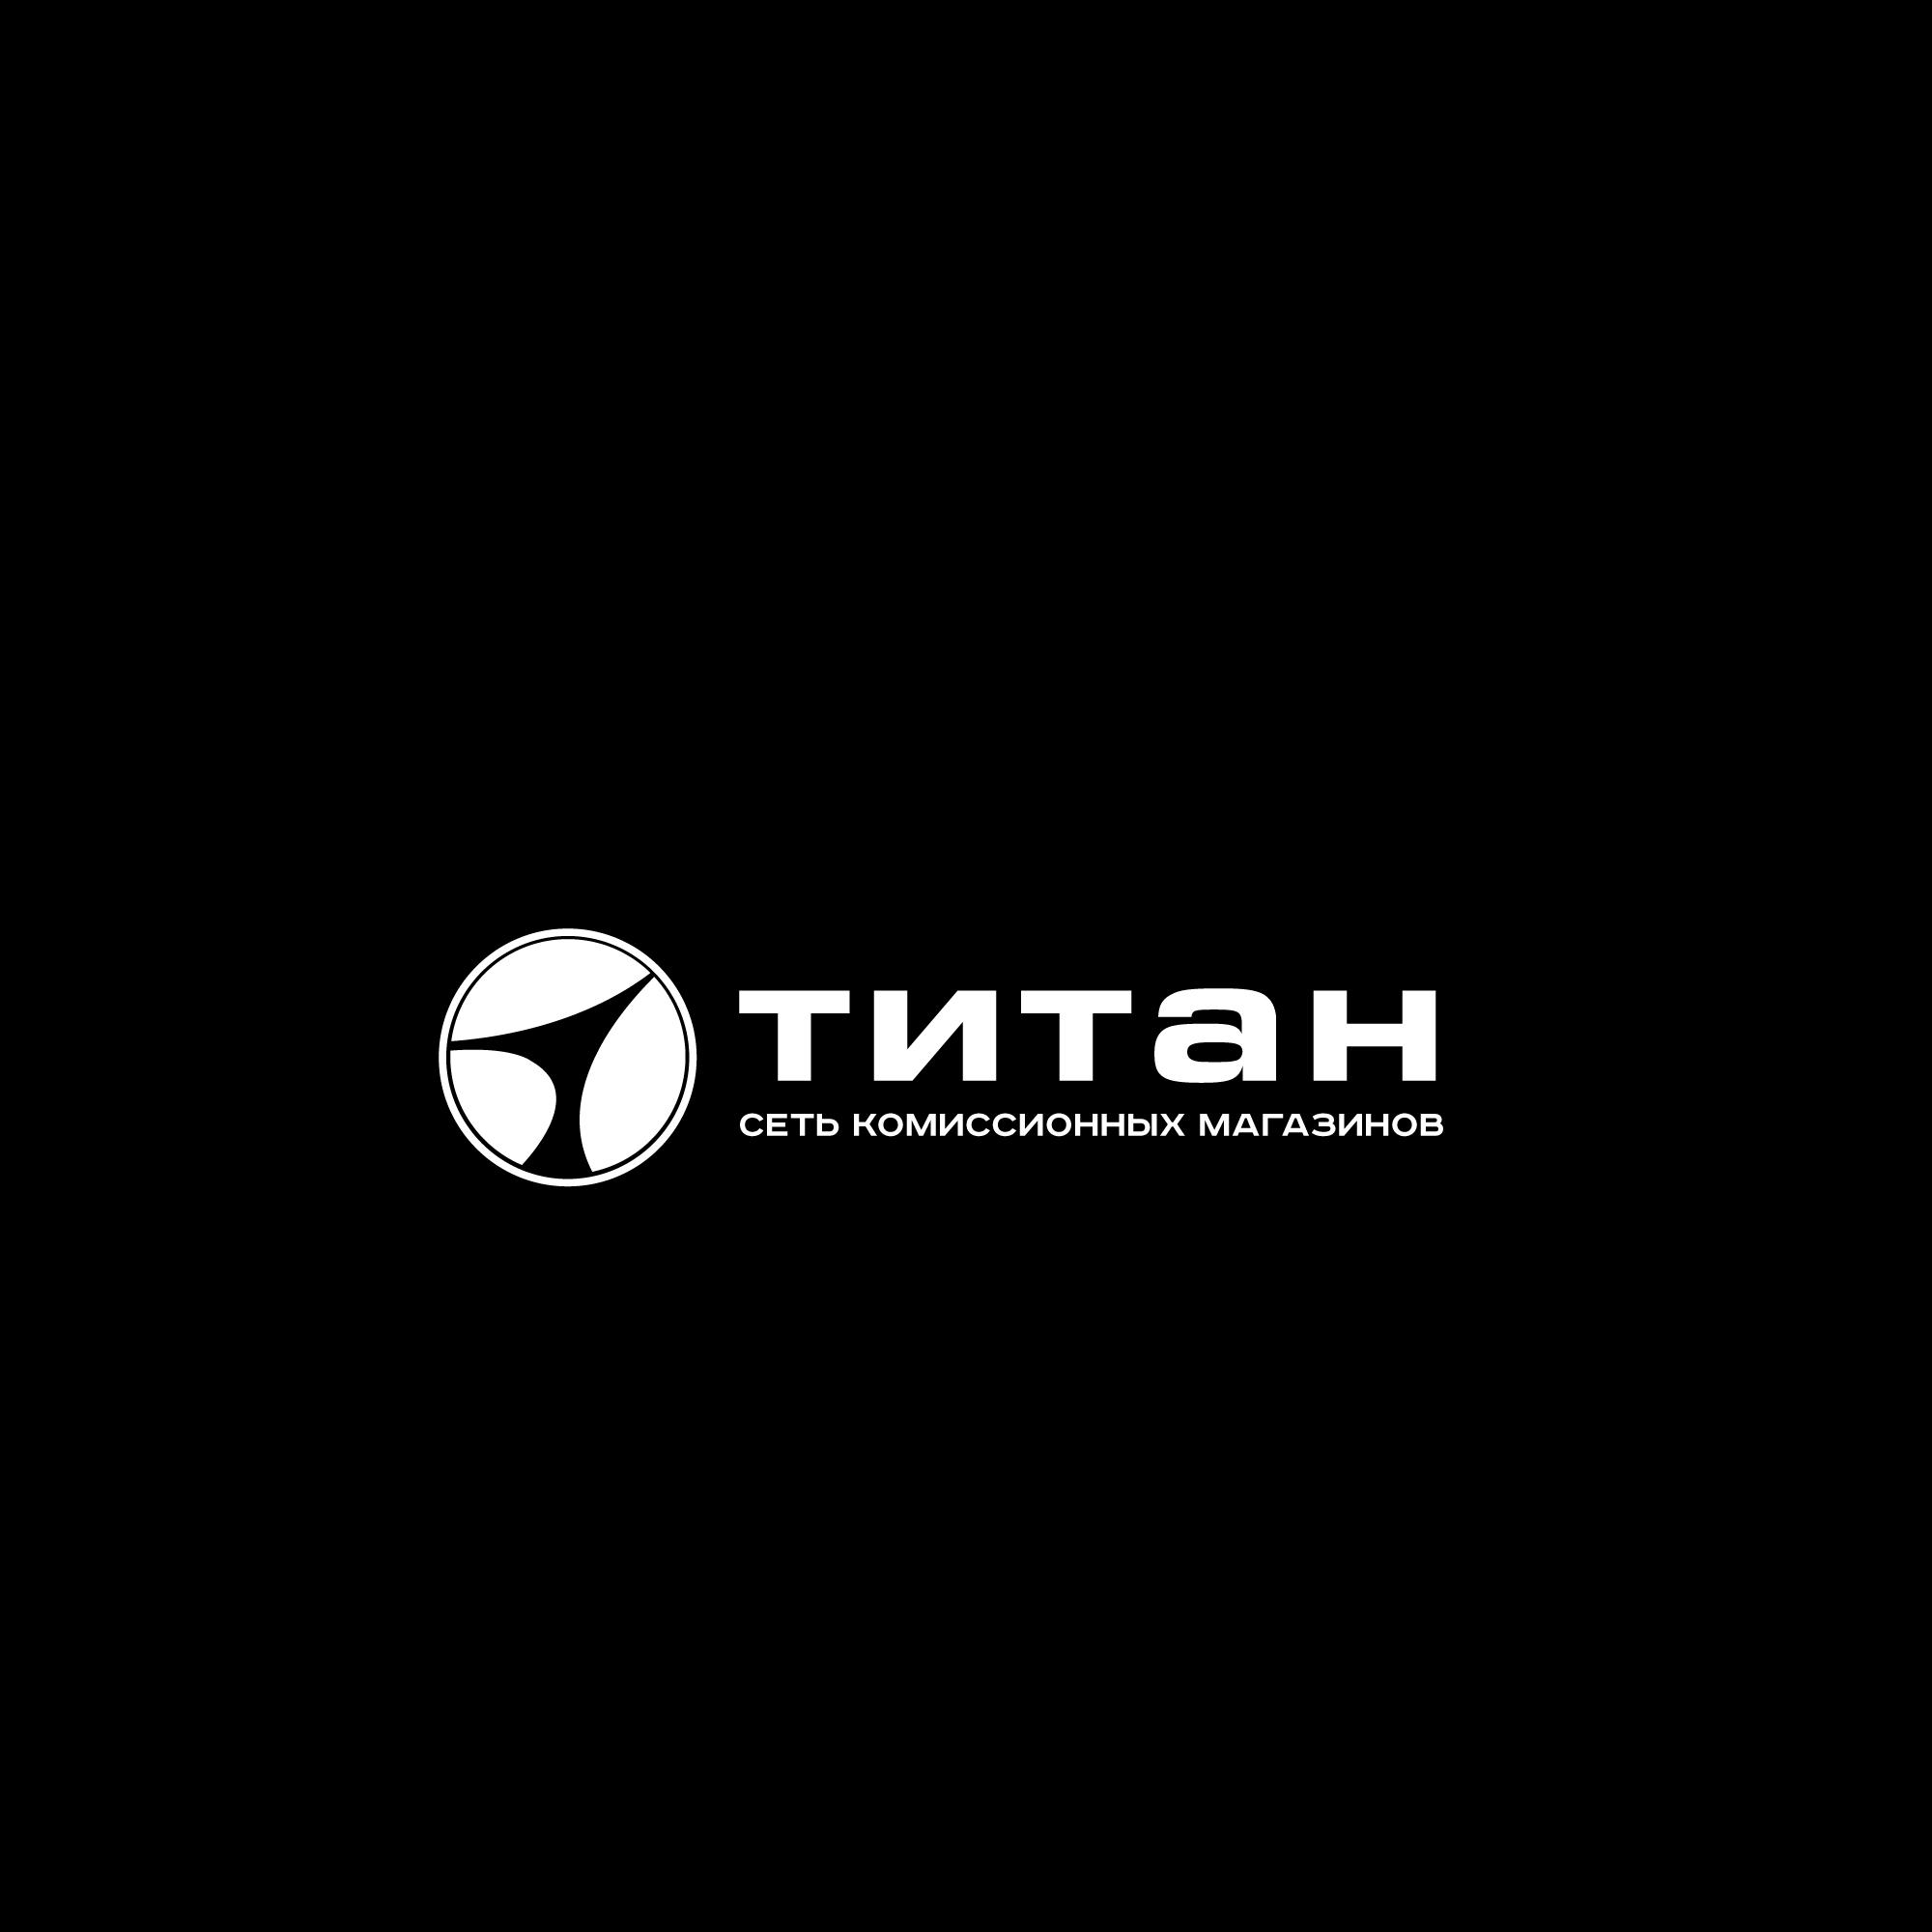 Разработка логотипа (срочно) фото f_9835d4ac79b9534d.jpg